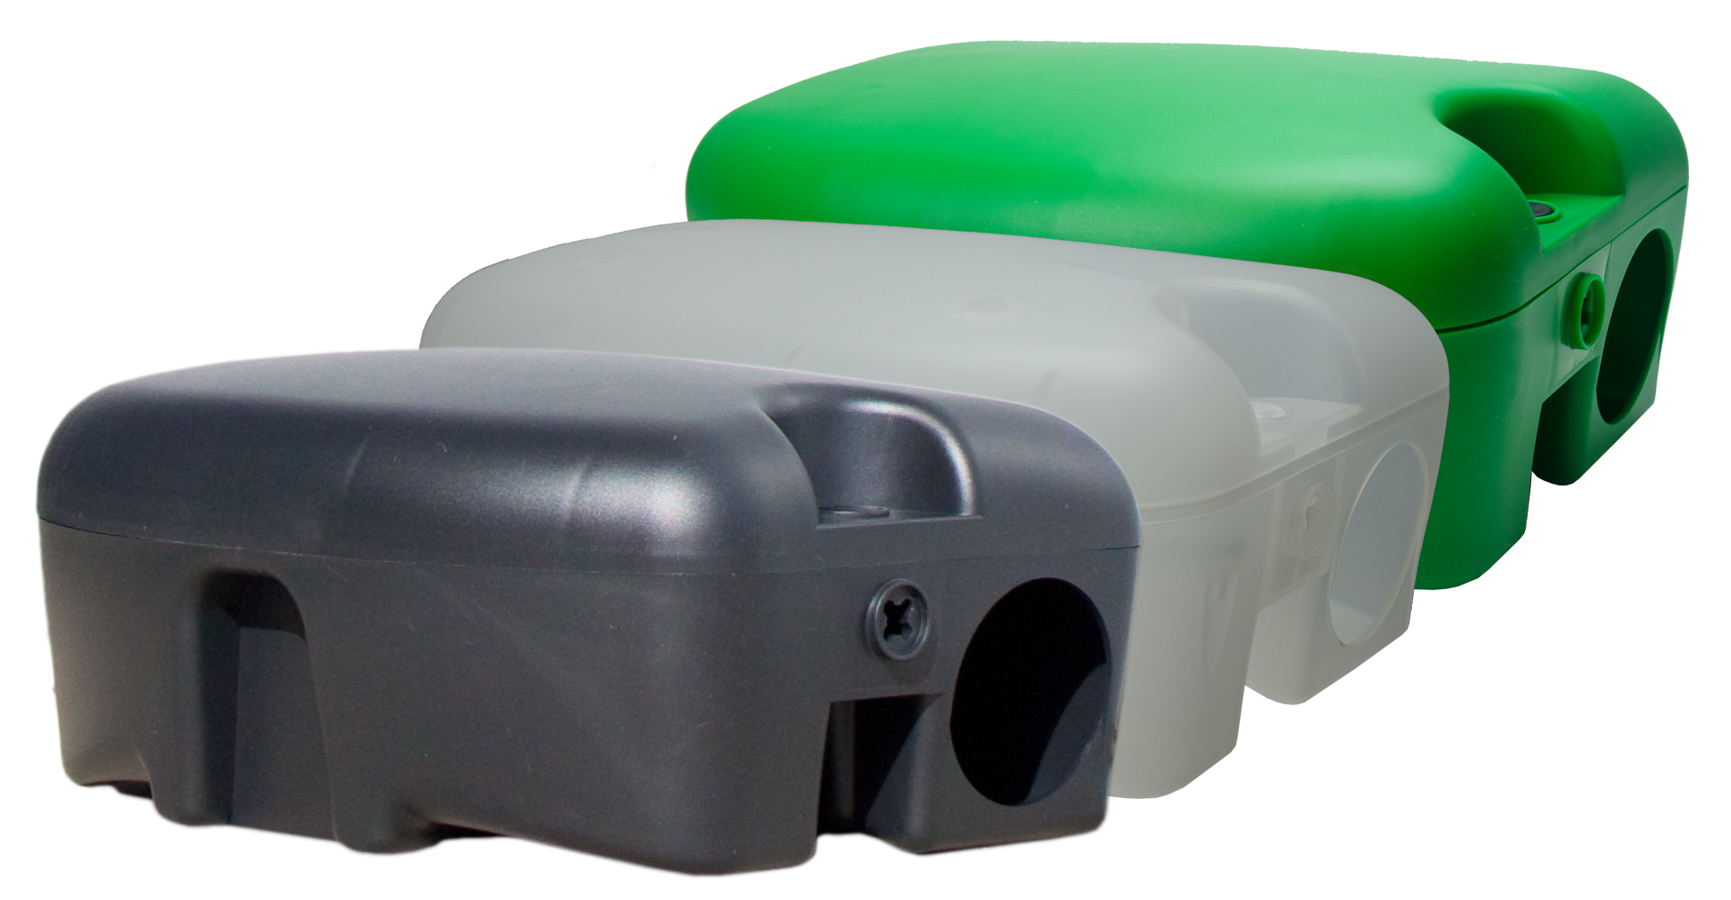 Voerdoos Atlantis rat/muis Groen met sleutel